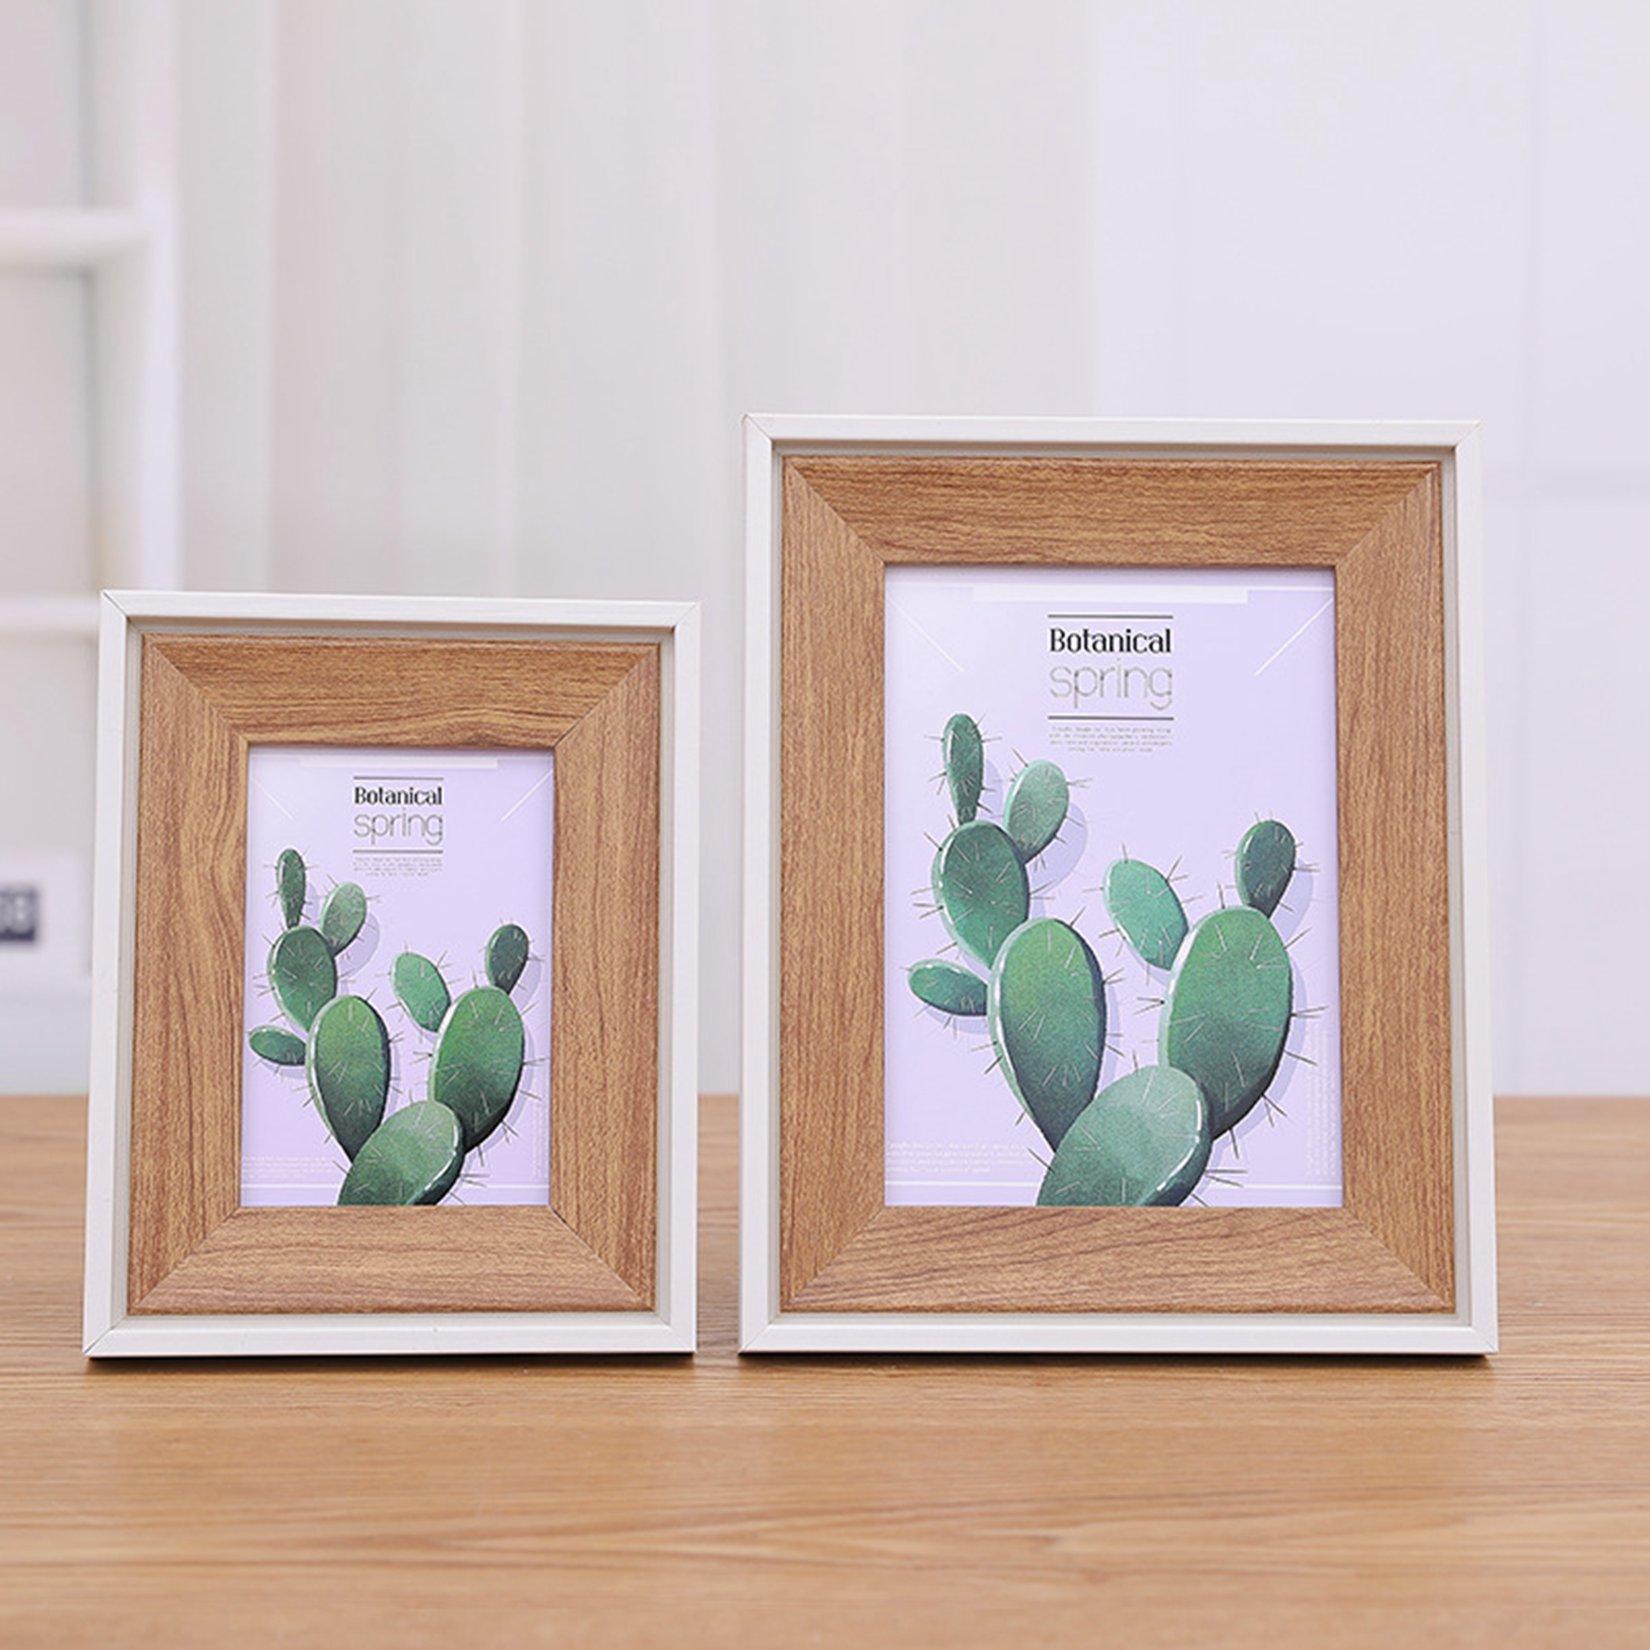 1 Pcs  Resin Table Picture Frames Black Photo Frame Desktop Picture Box for Living Room Crafts Home Bedroom Decor 5/6/7/8 Inch